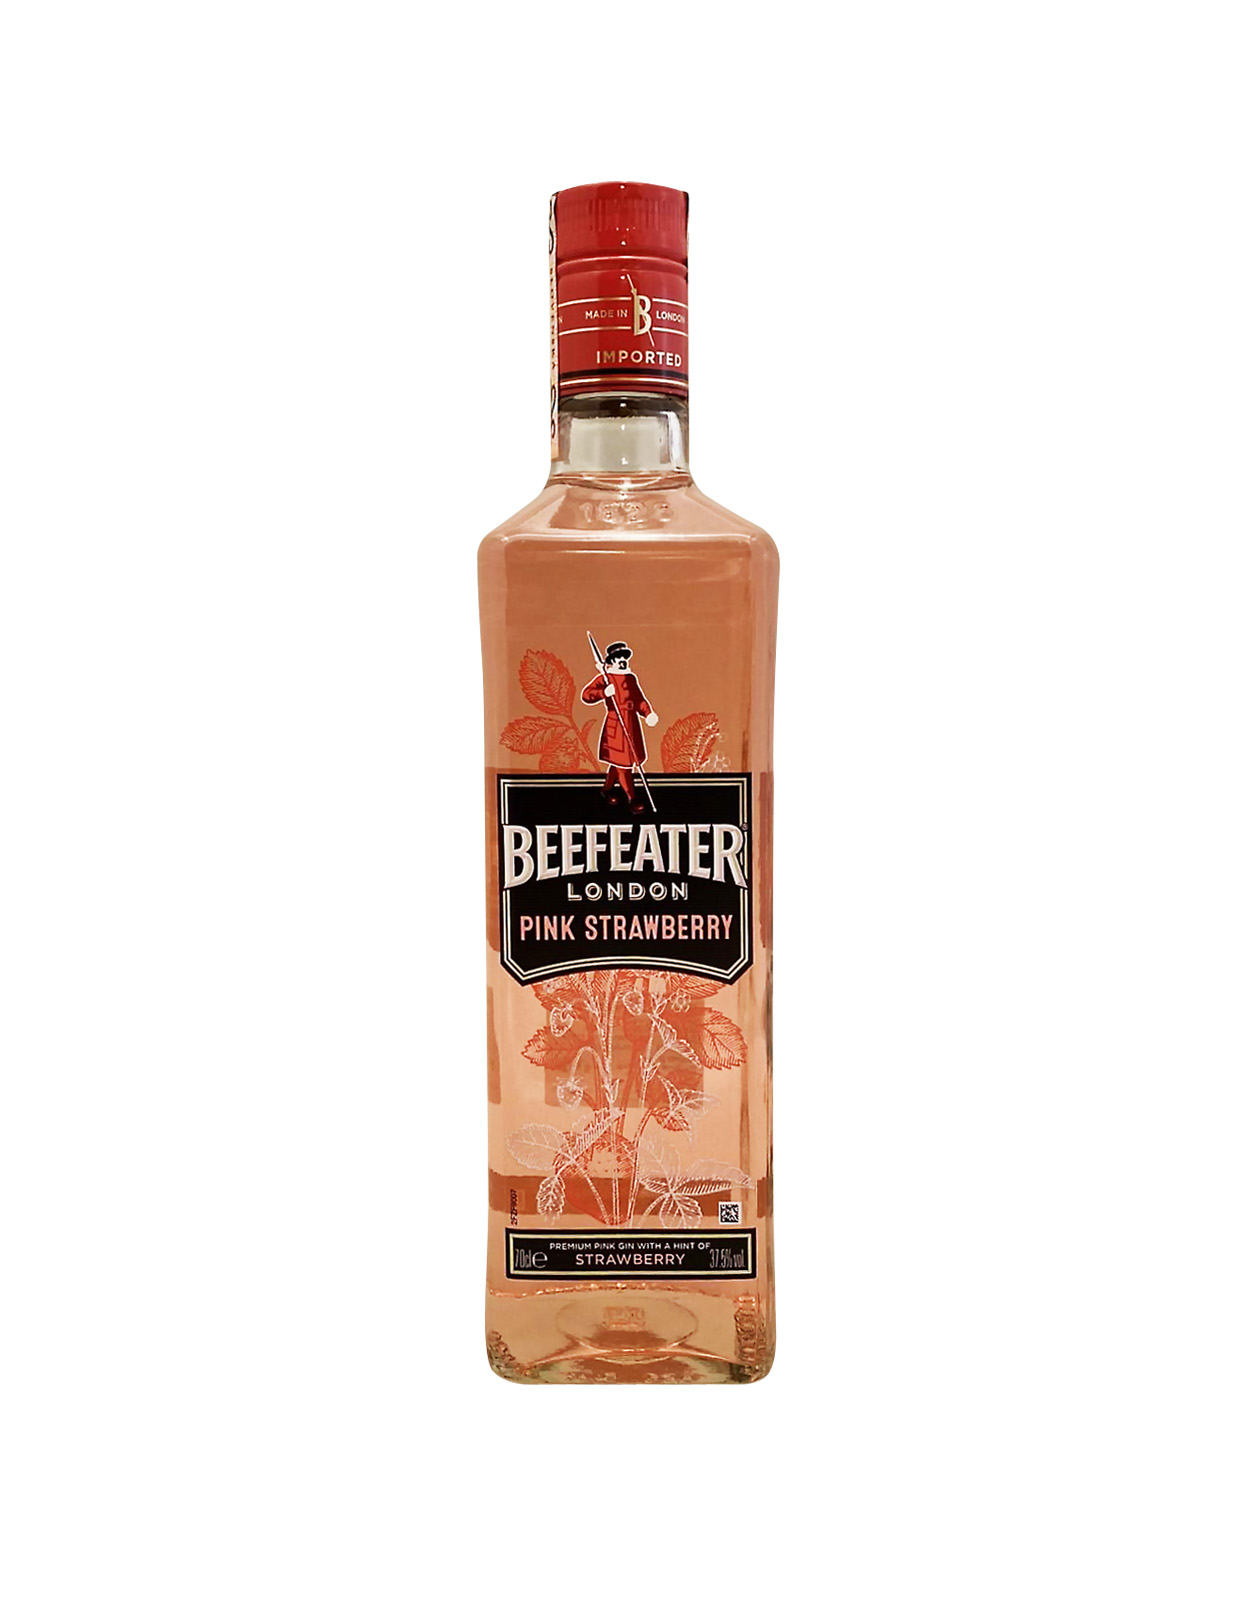 Beefeater Pink 37%, Bottleshop Sunny wines slnecnice mesto, petrzalka, Gin, rozvoz alkoholu, eshop